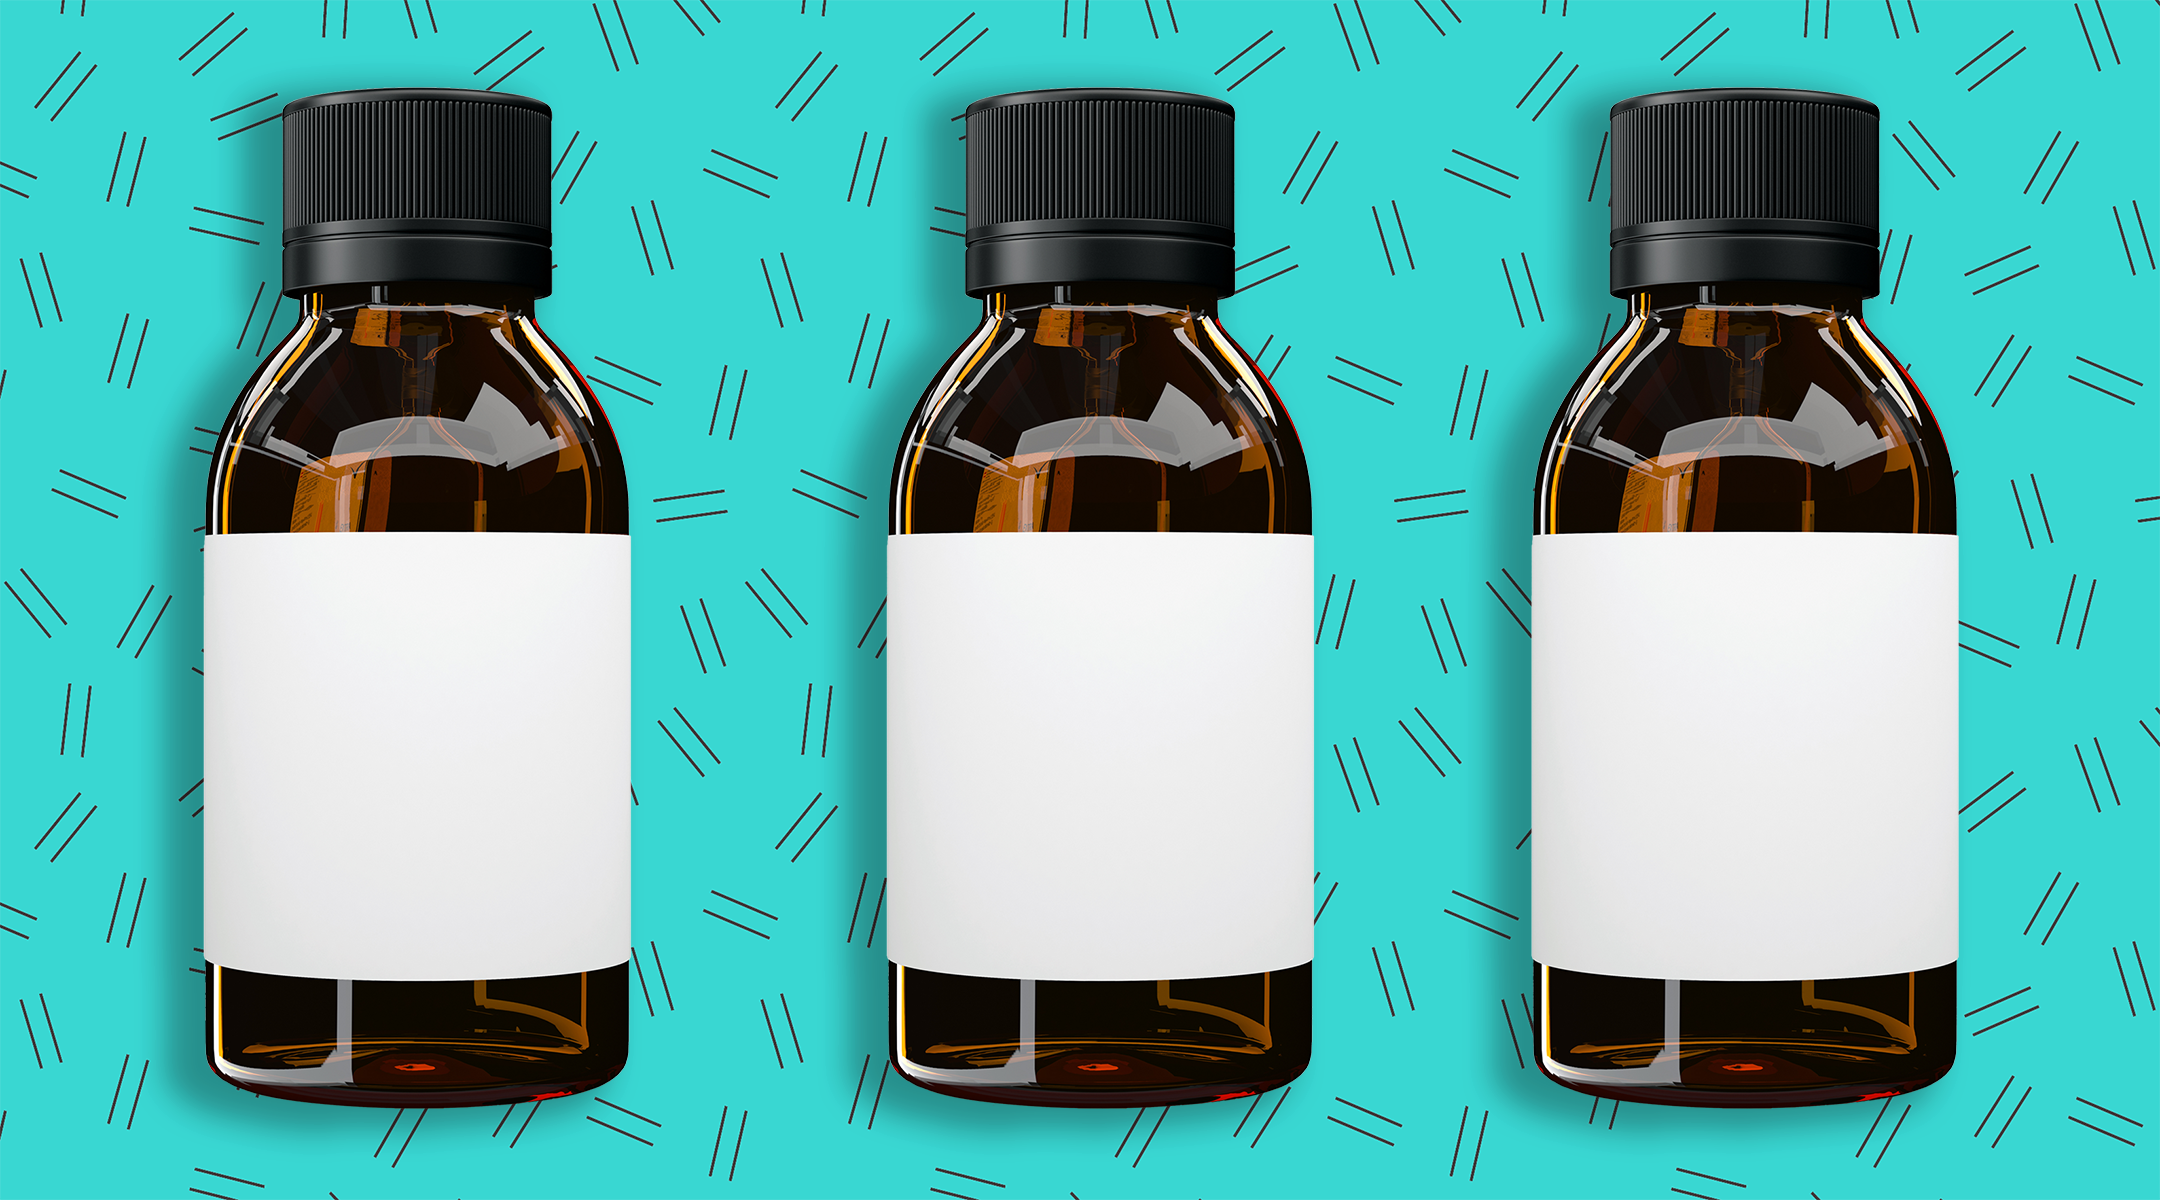 glass medicine bottles on pattern background